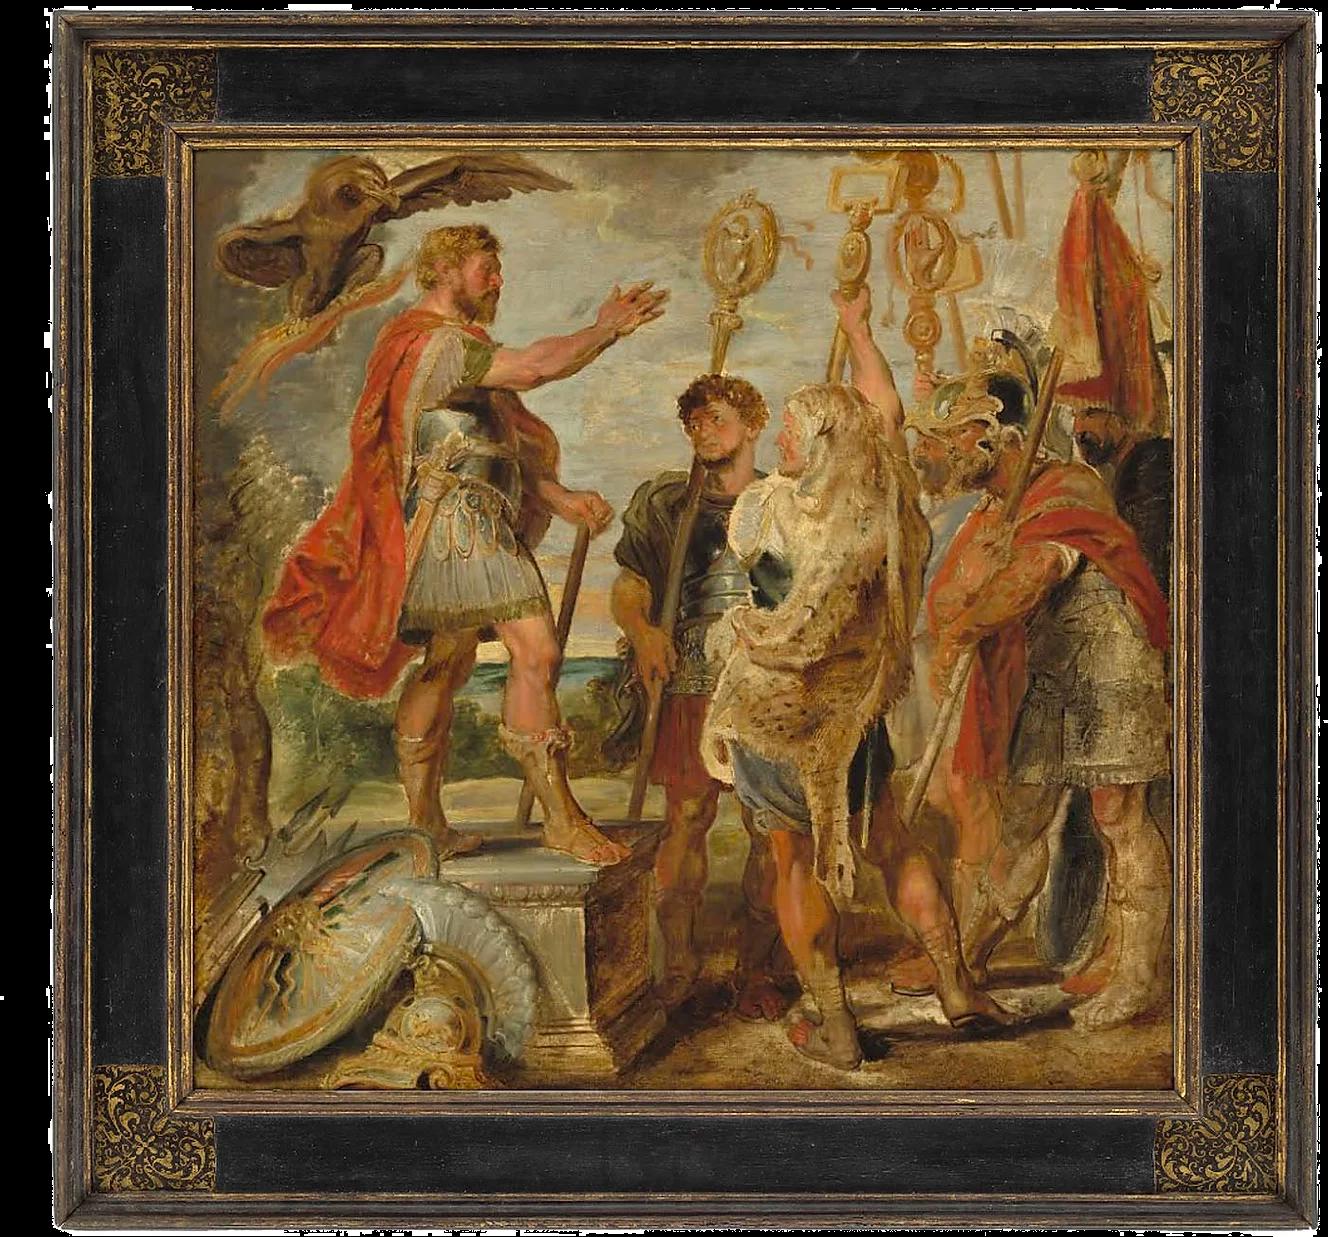 National Art Gallery Framing a Heroic Scene by Rubens